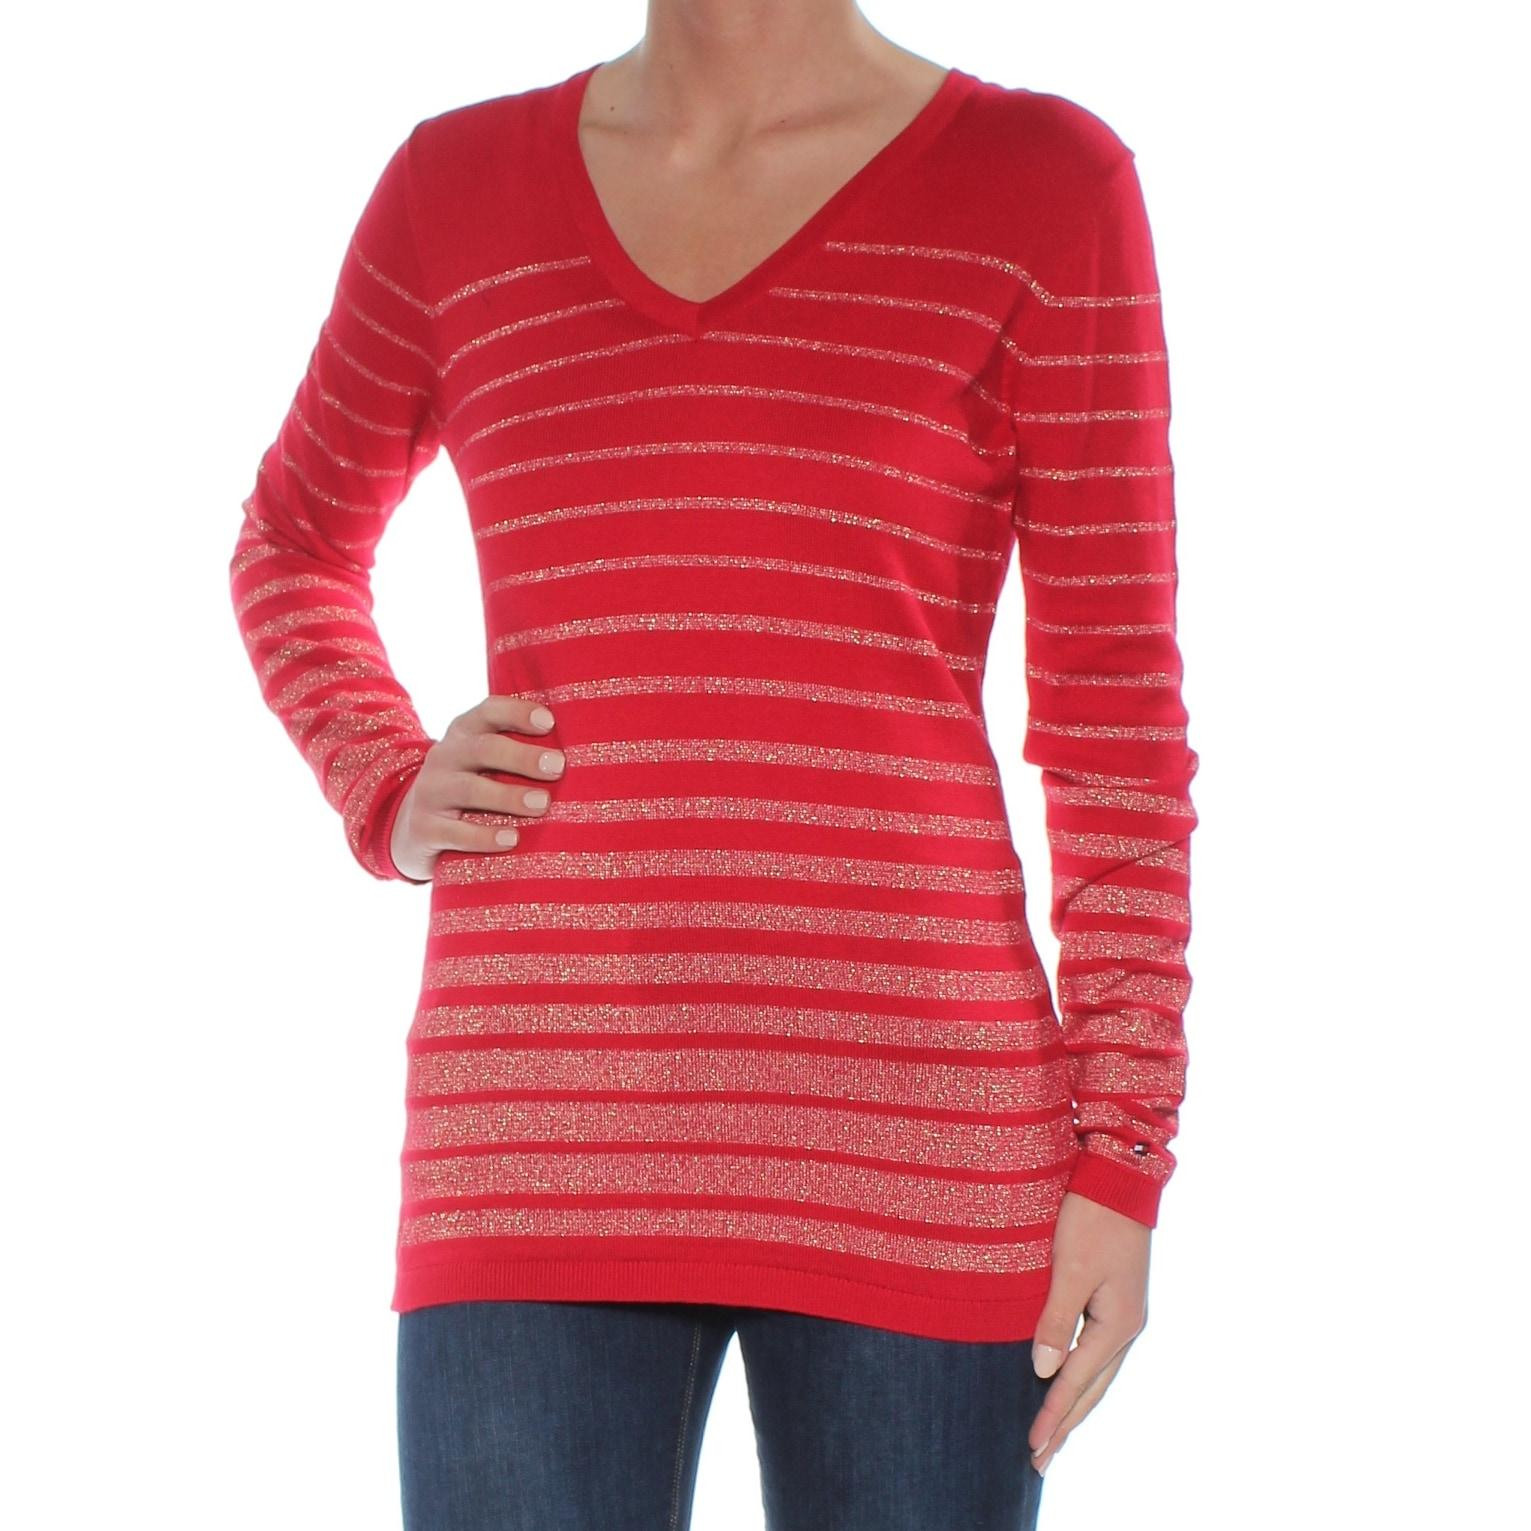 c6719f27247 Tommy Hilfiger Women s Sweaters